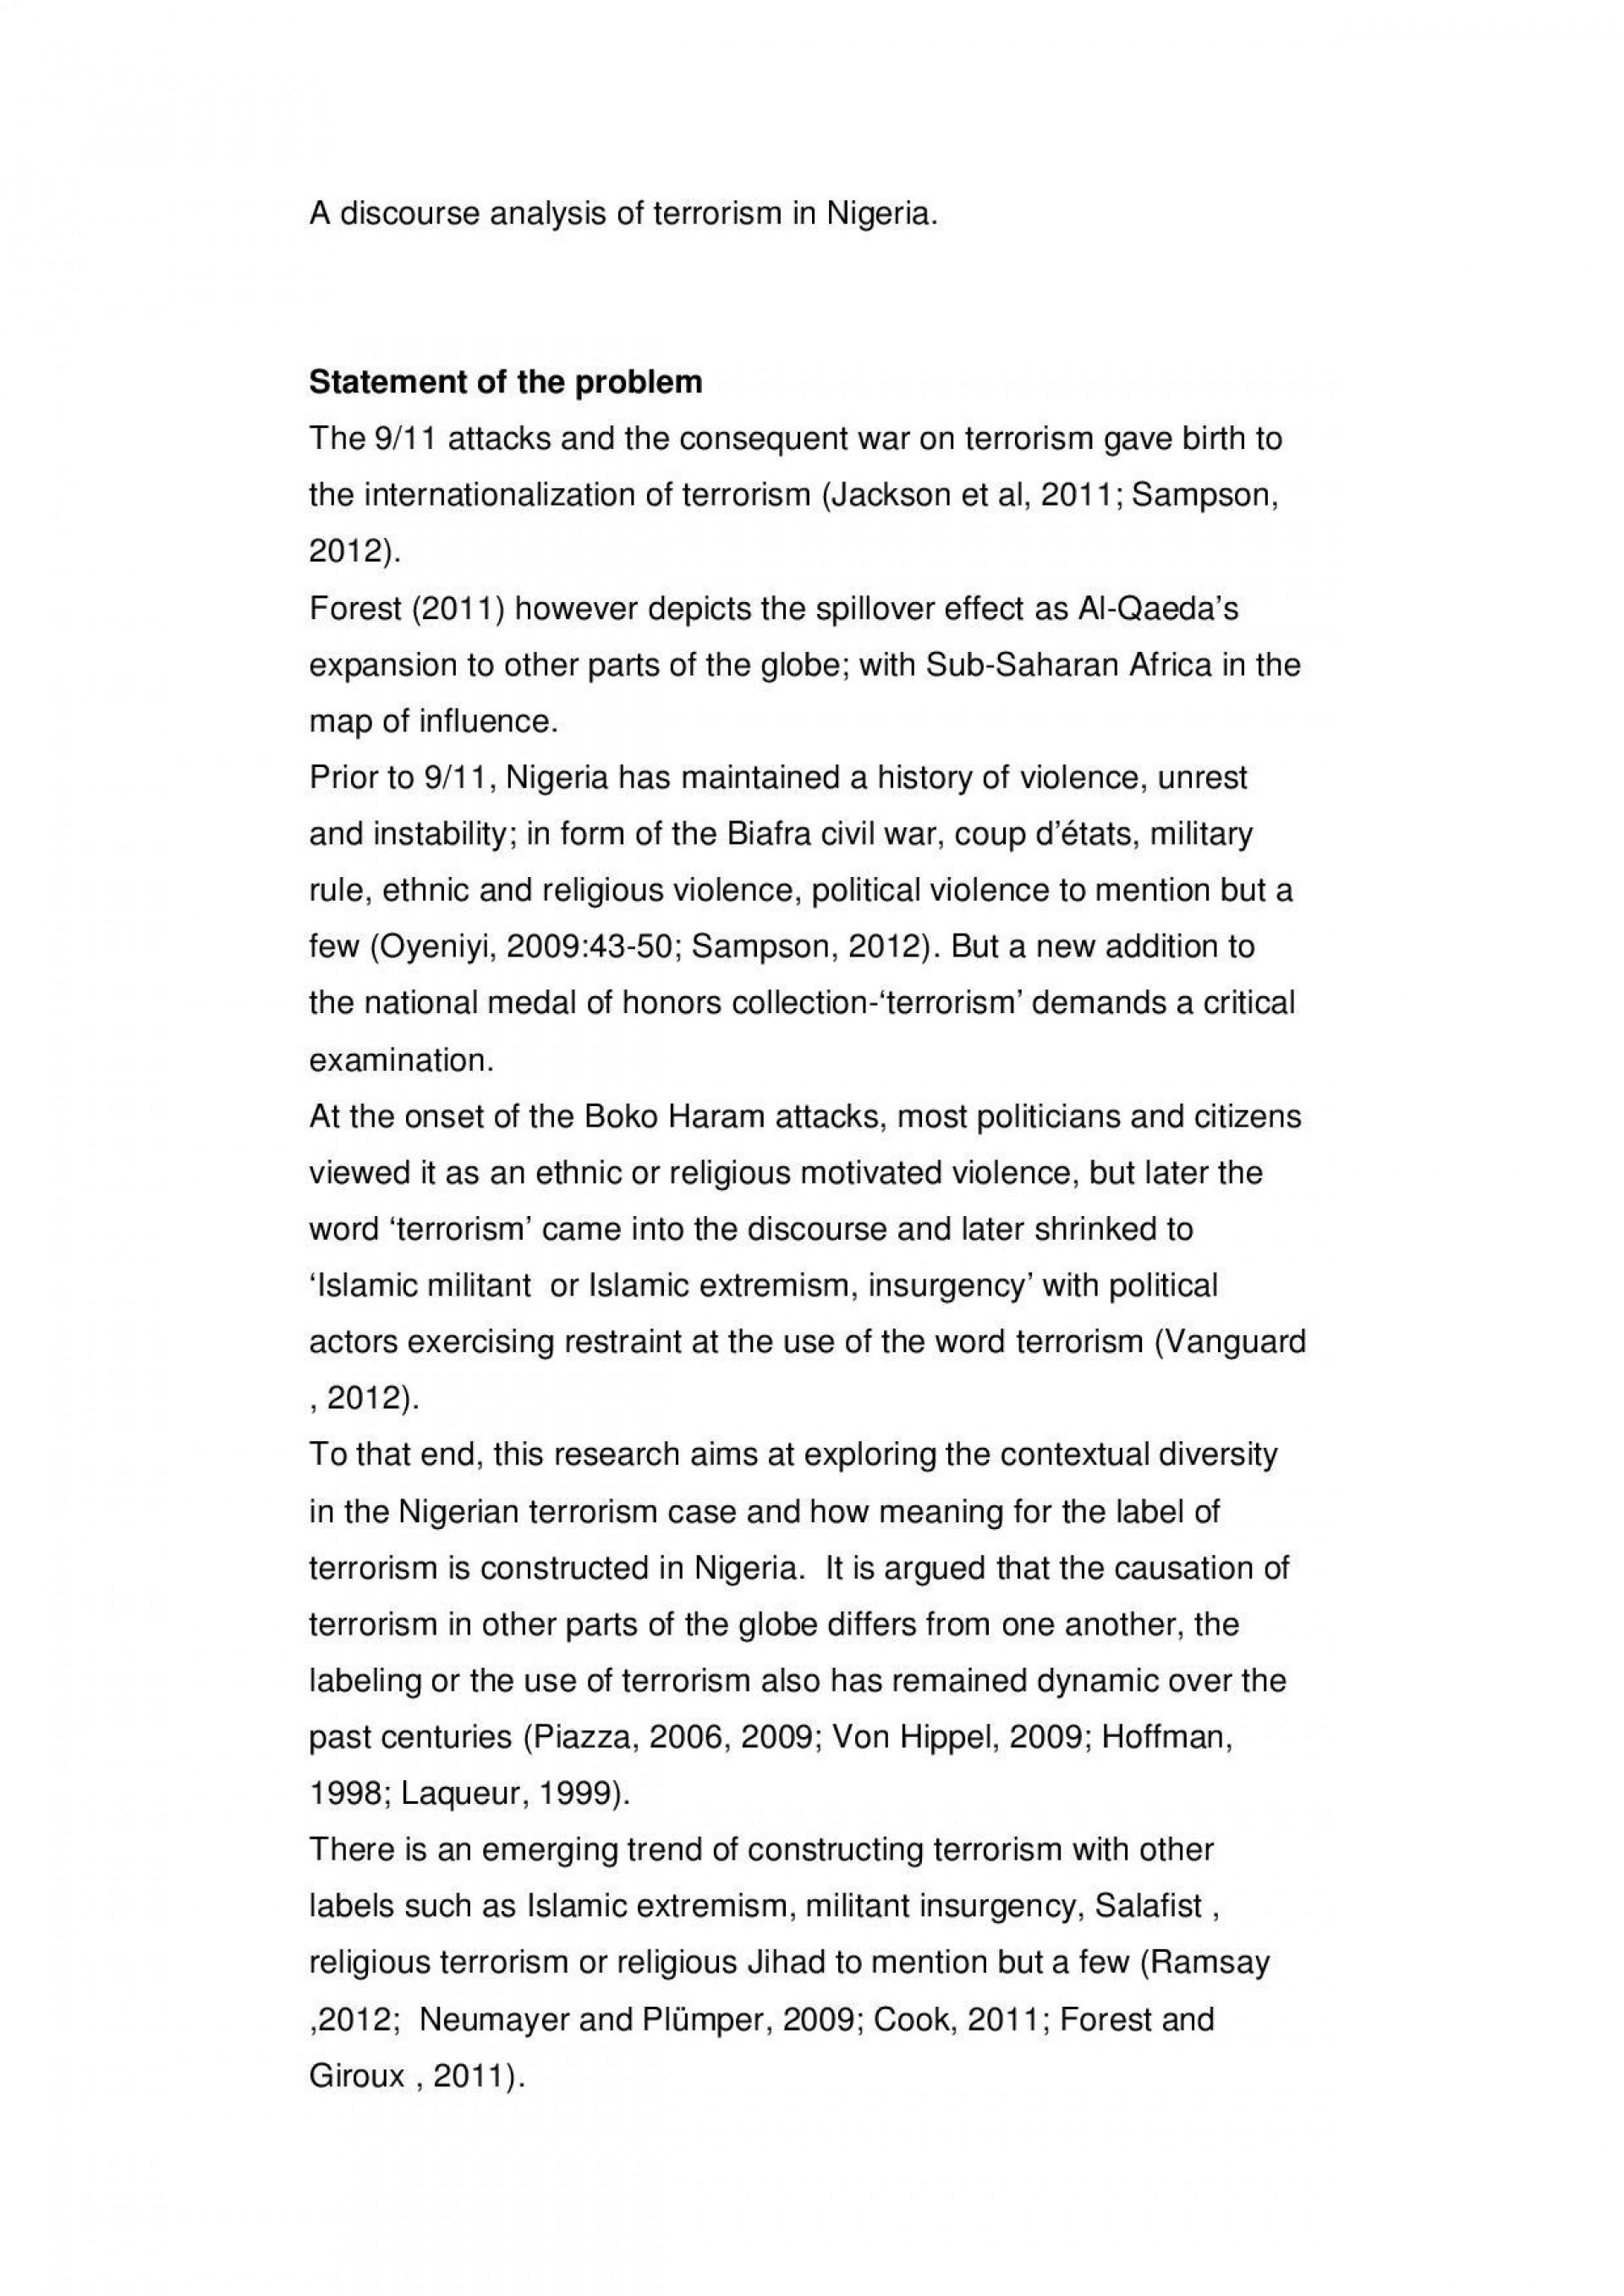 024 Essay Example Terrorism Global Writing Tips Uk Writers Online On Proposal Pag In English Pakistan Telugu World Pdf Nigeria Hindi Wonderful Topics War 1920